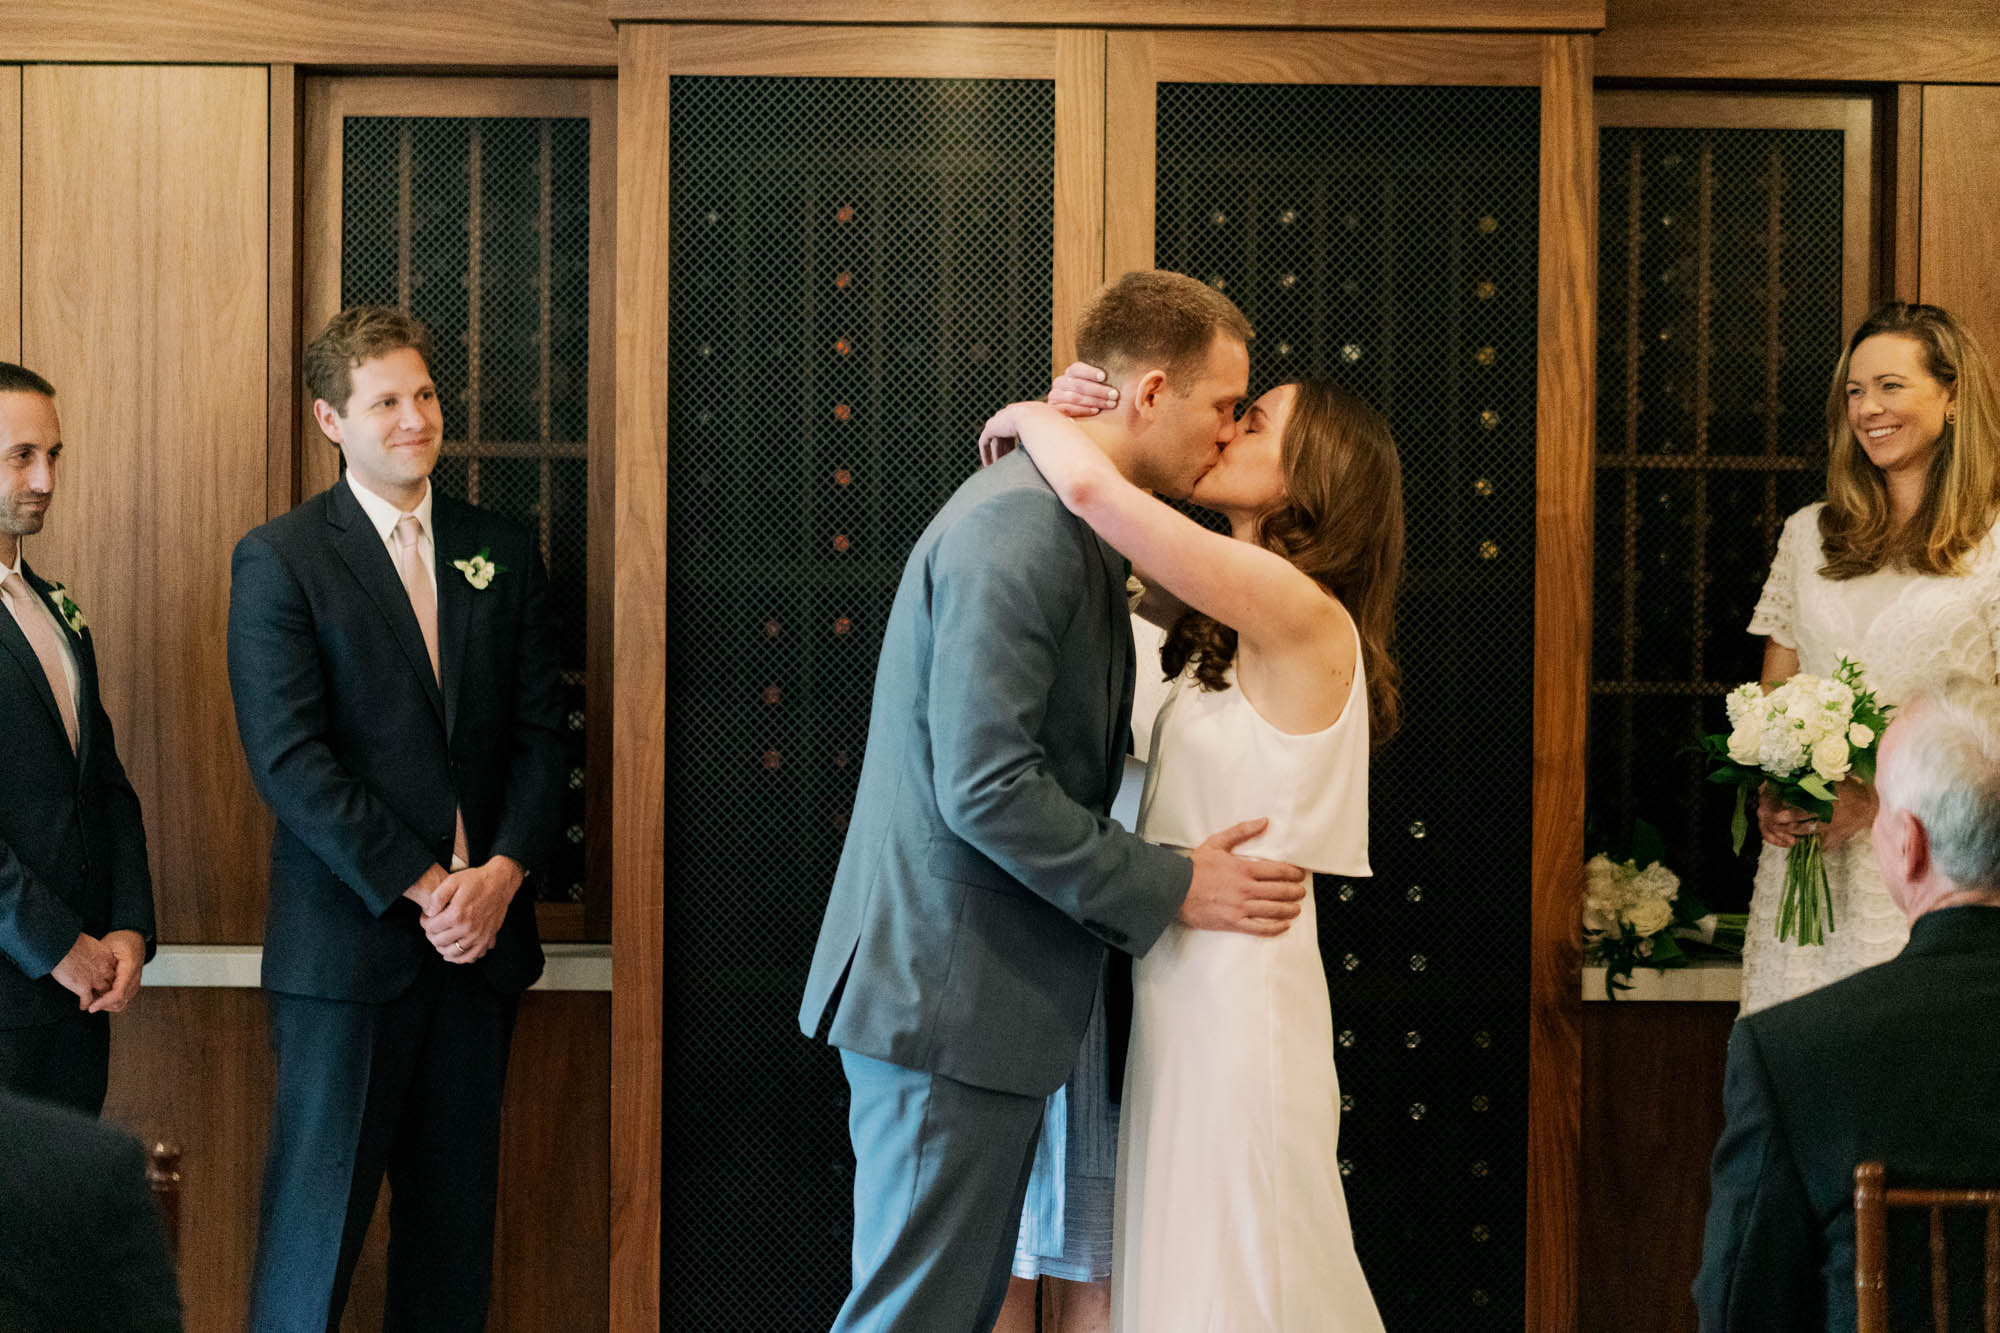 Vina Enoteca Palo Alto Wedding 031.jpg